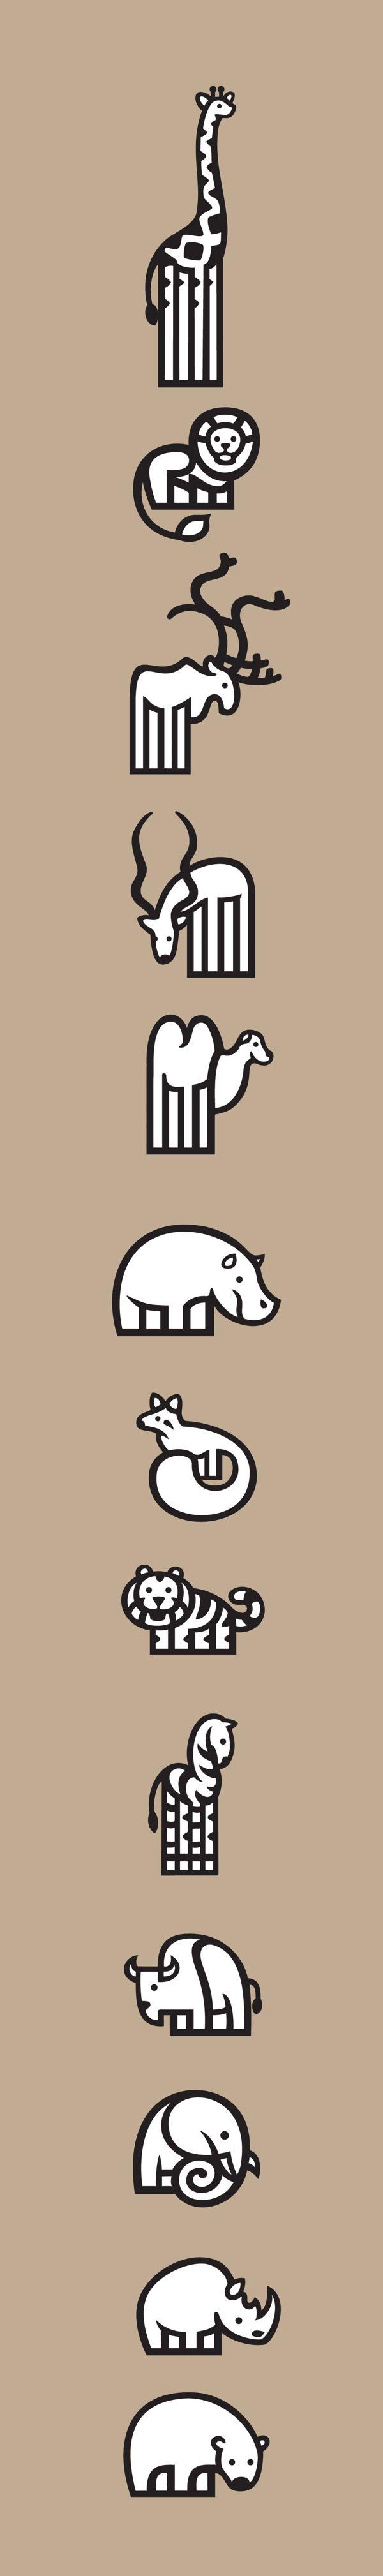 Géométric  draw animal